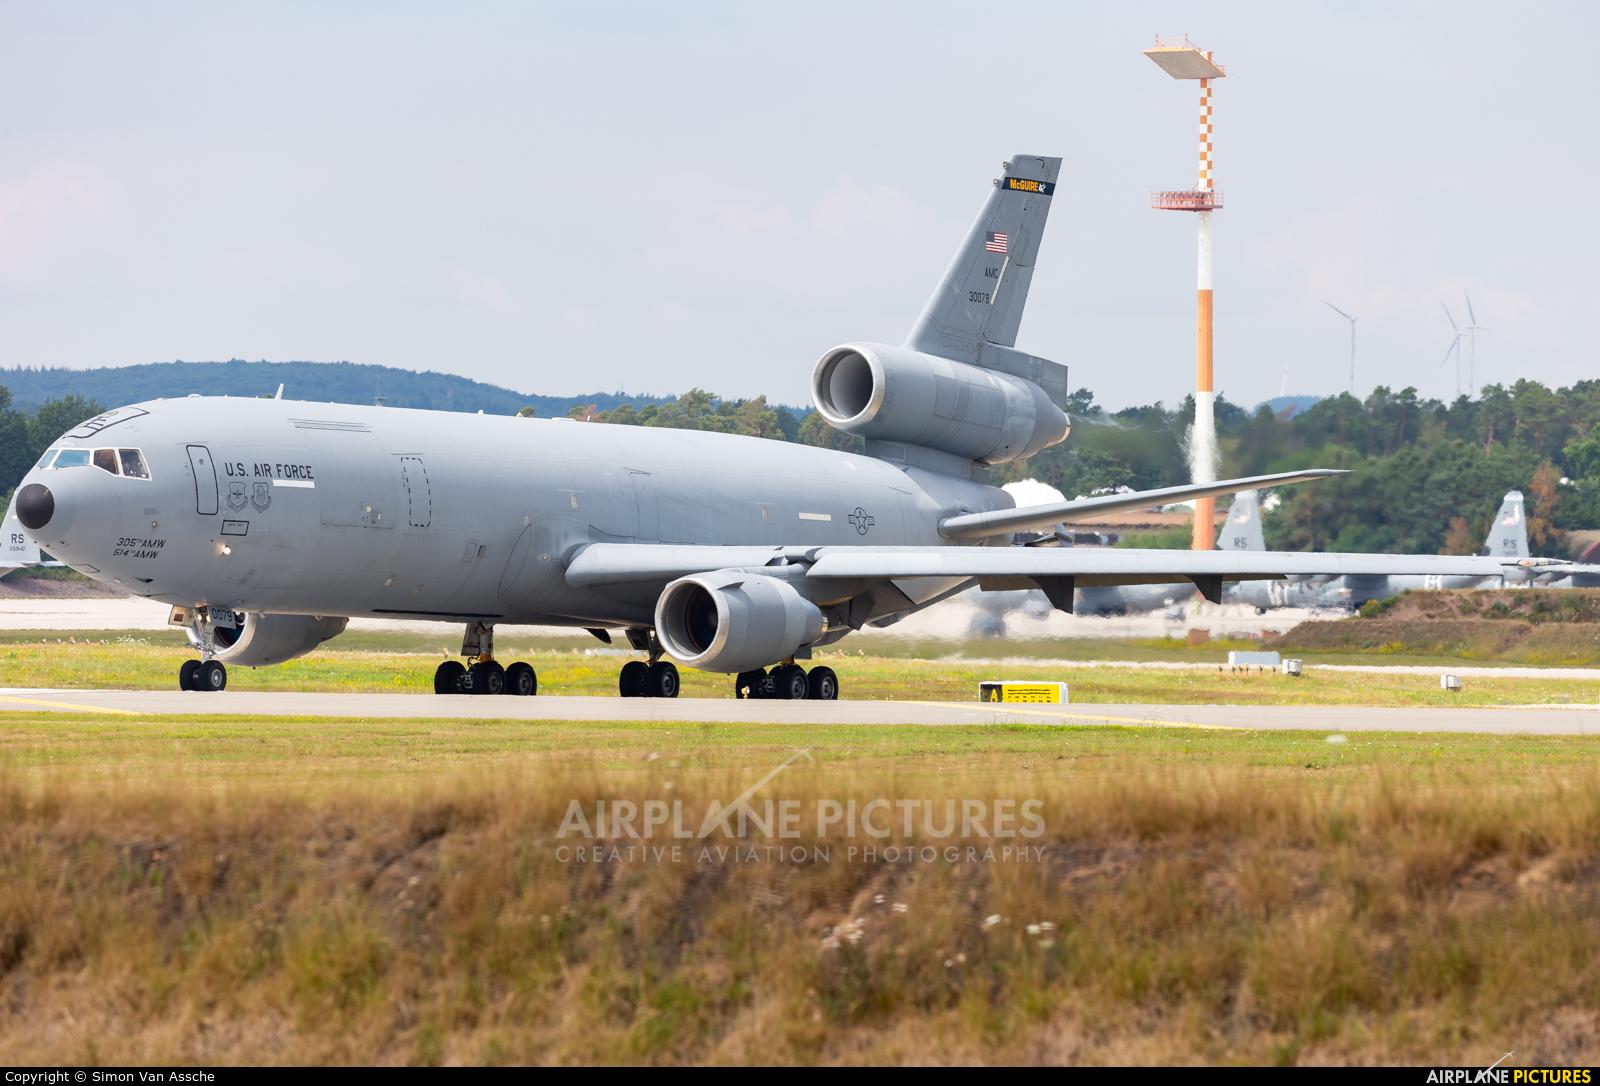 USA - Air Force 83-0079 aircraft at Ramstein